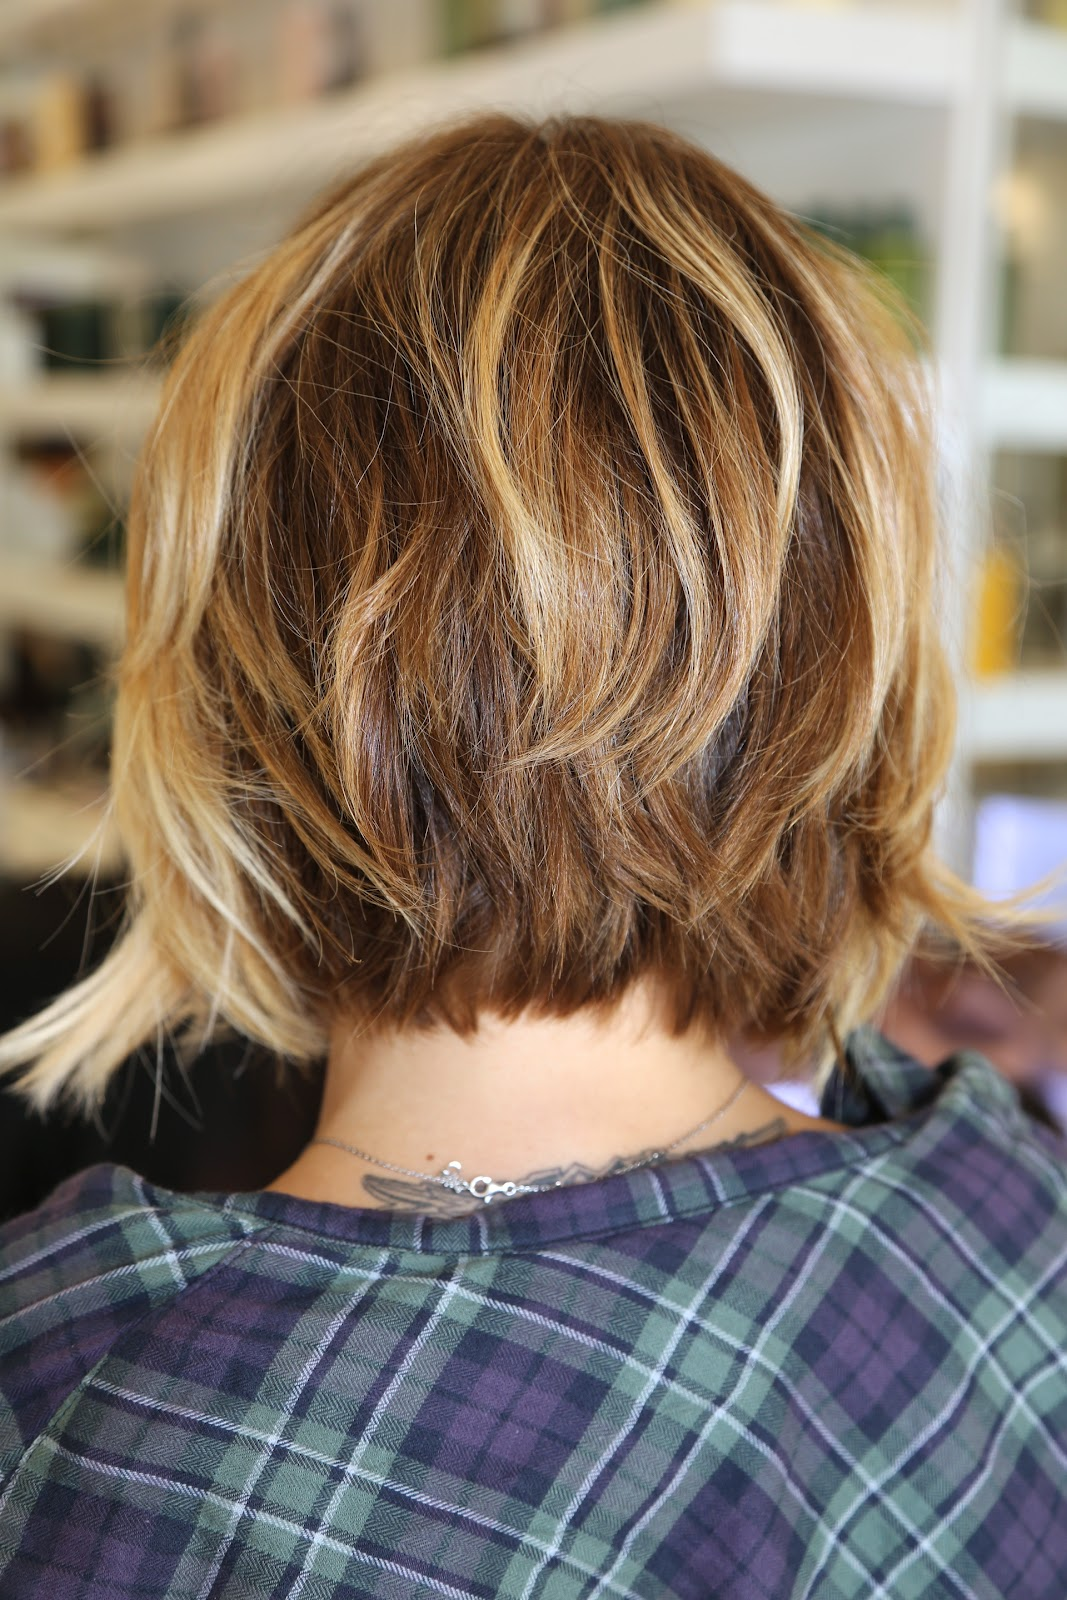 Layered haircut for little girl